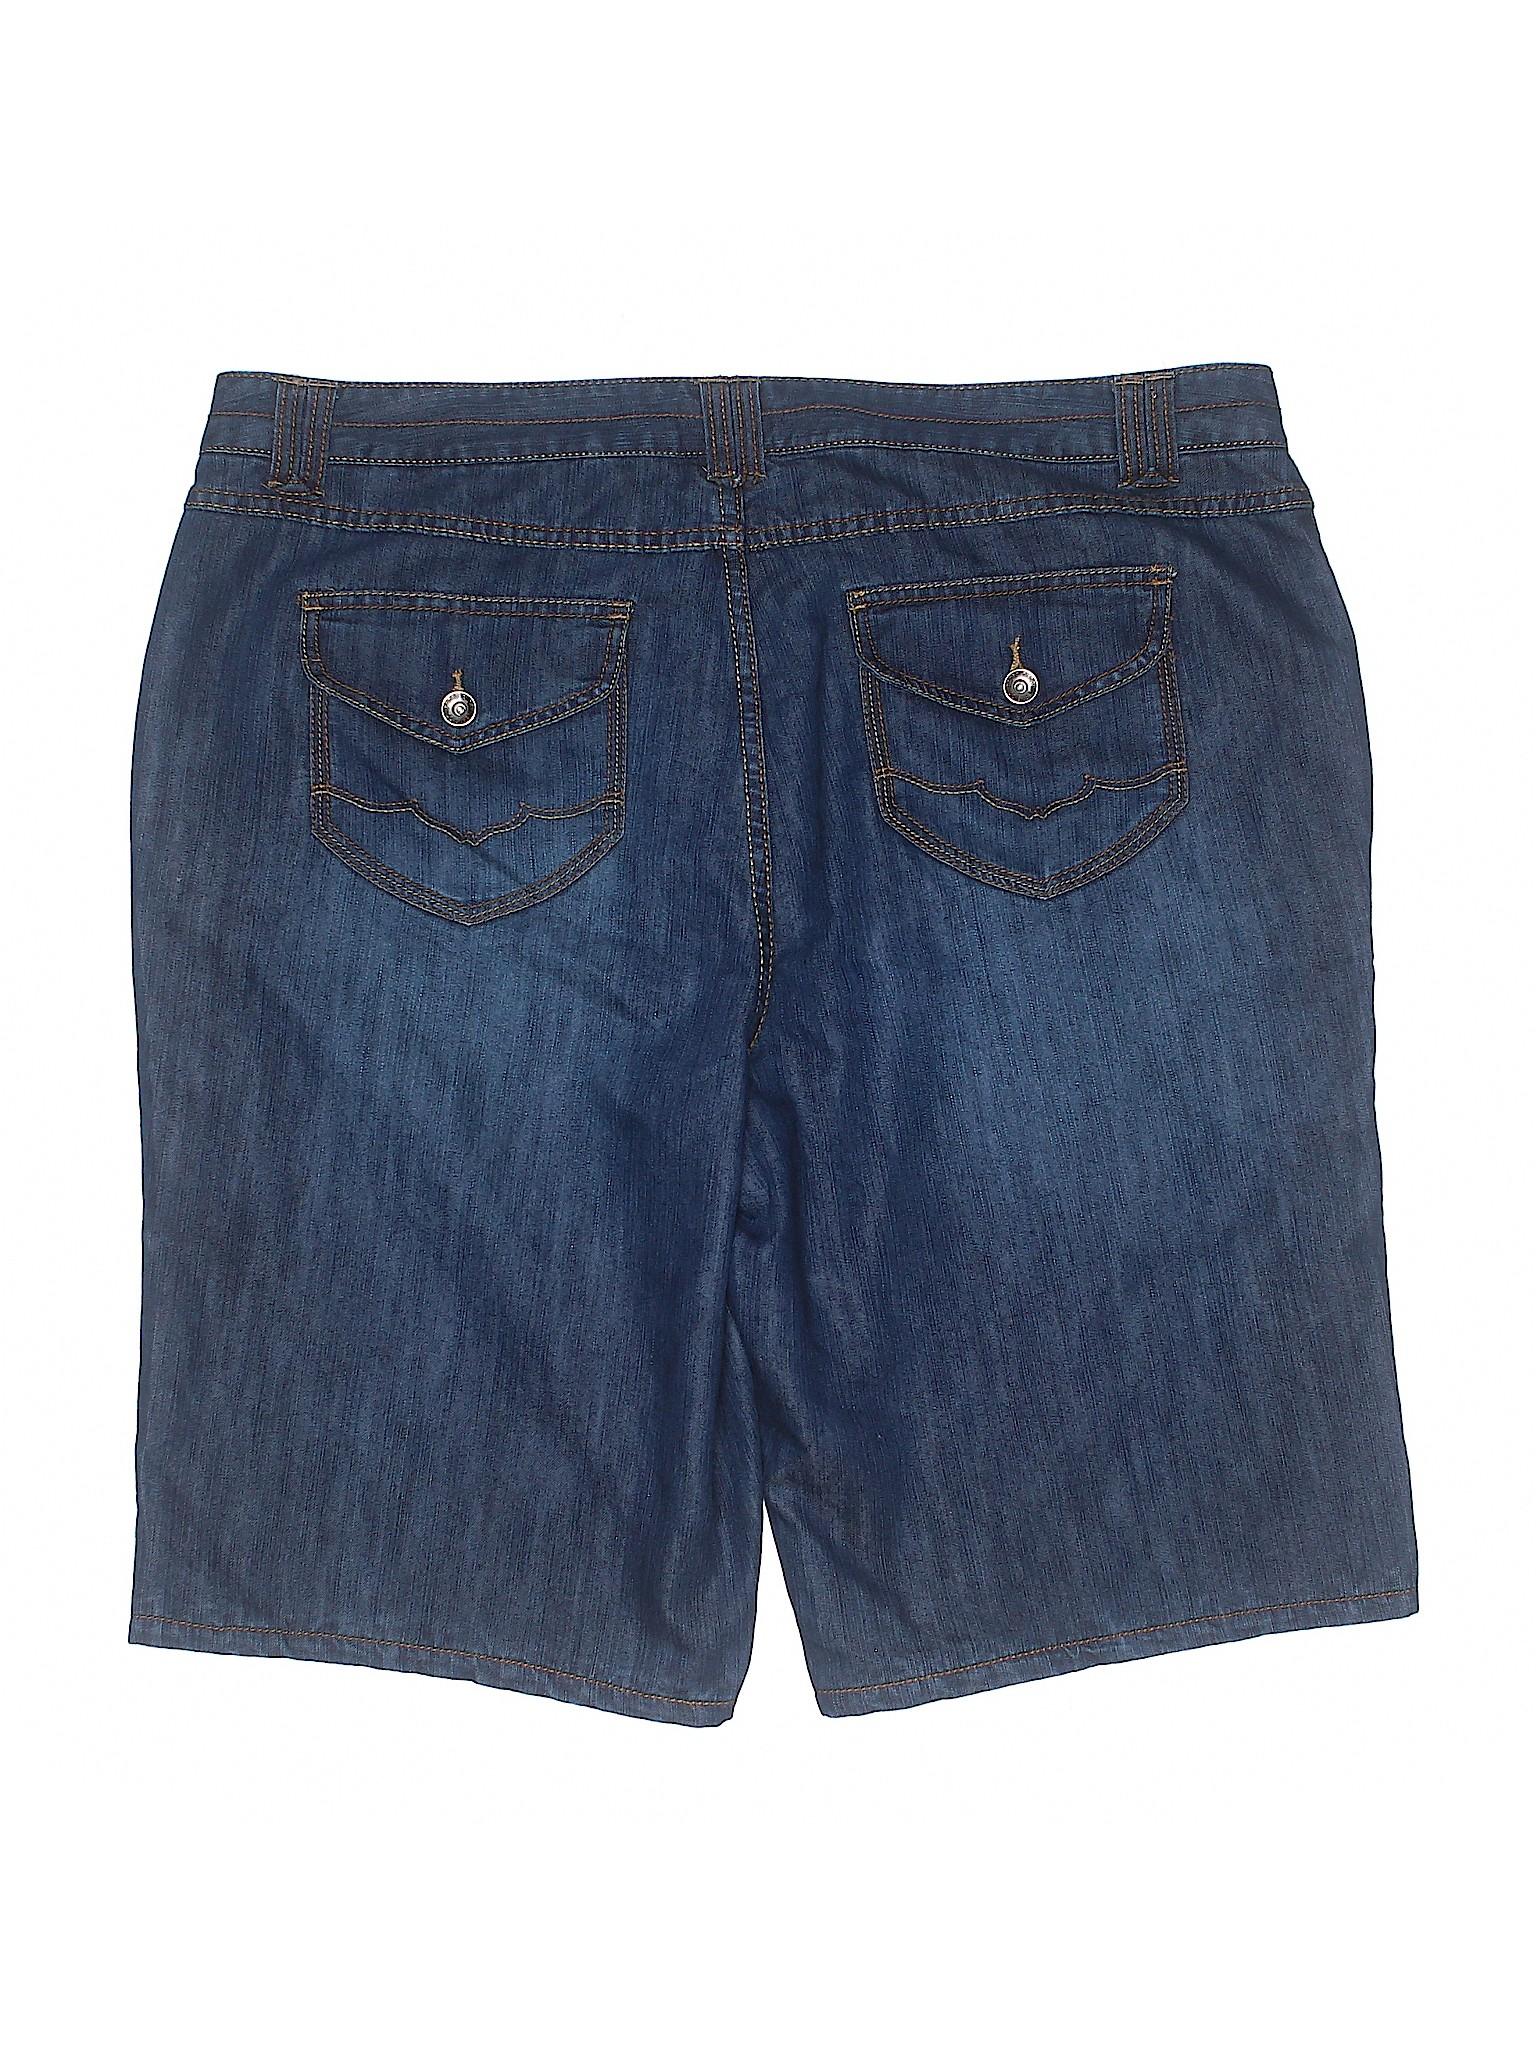 Shorts Boutique Boutique Glory Denim Faded Boutique Denim Faded Glory Shorts qEw4xB7v